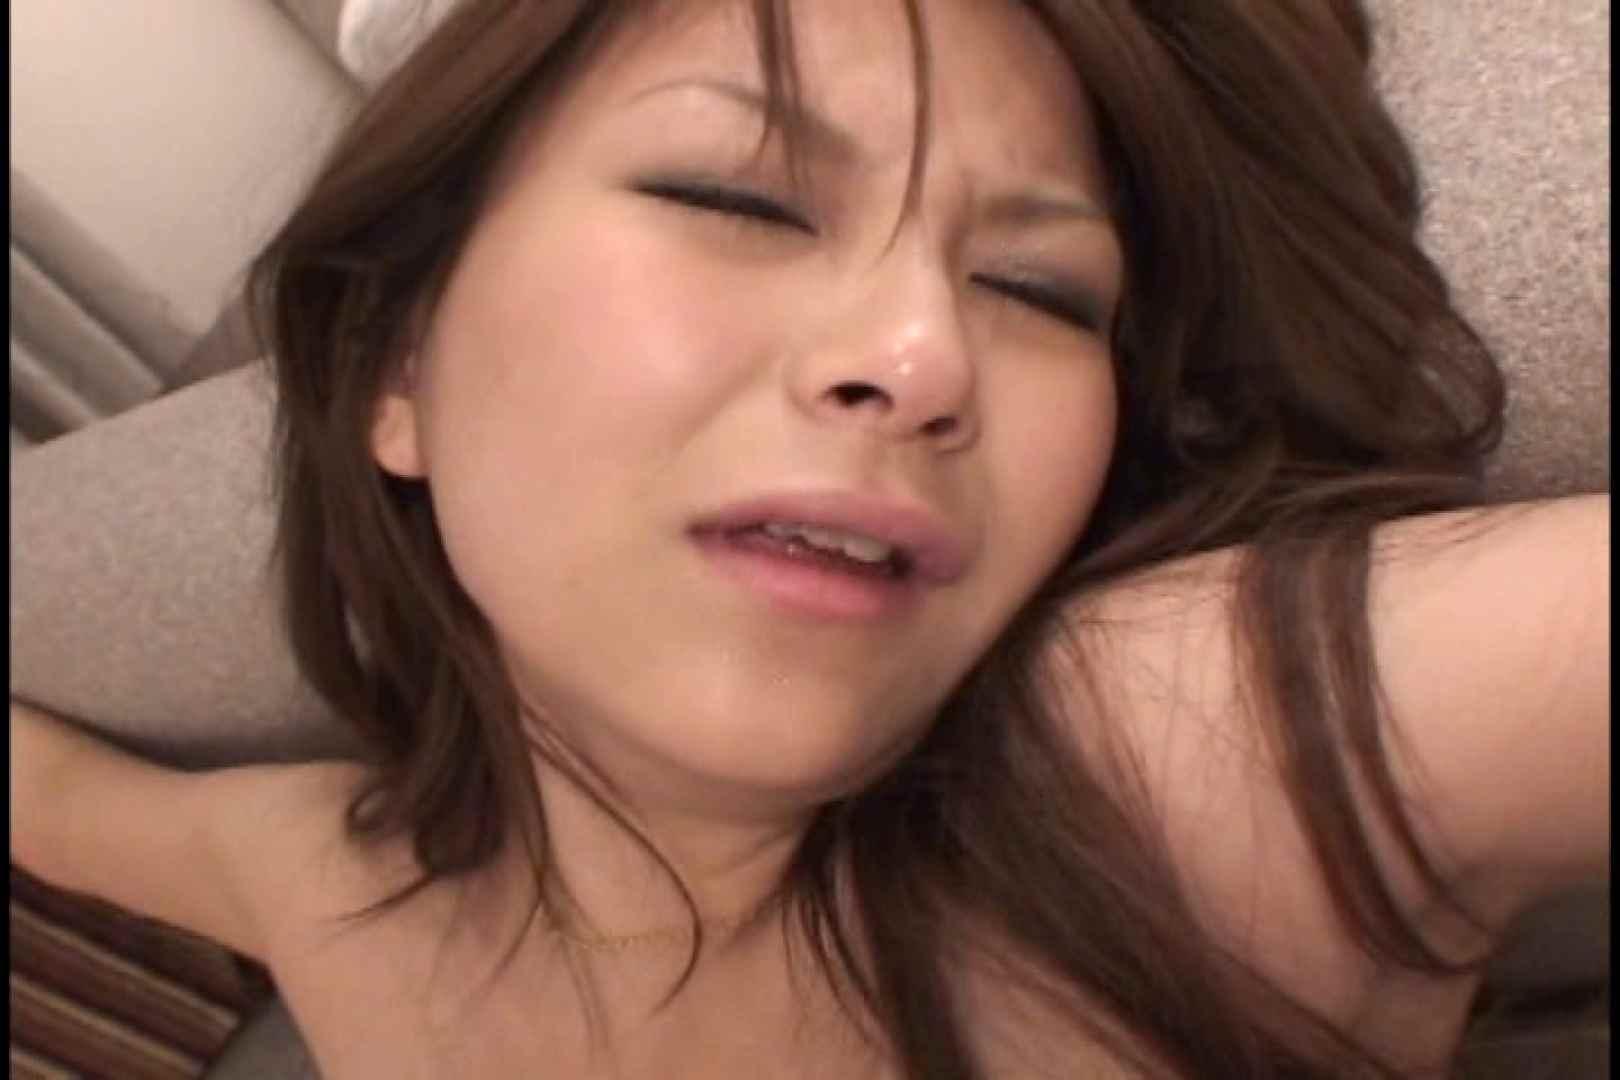 JDハンター全国ツアー vol.009 後編 女子大生のエロ動画 | 0  112PIX 77